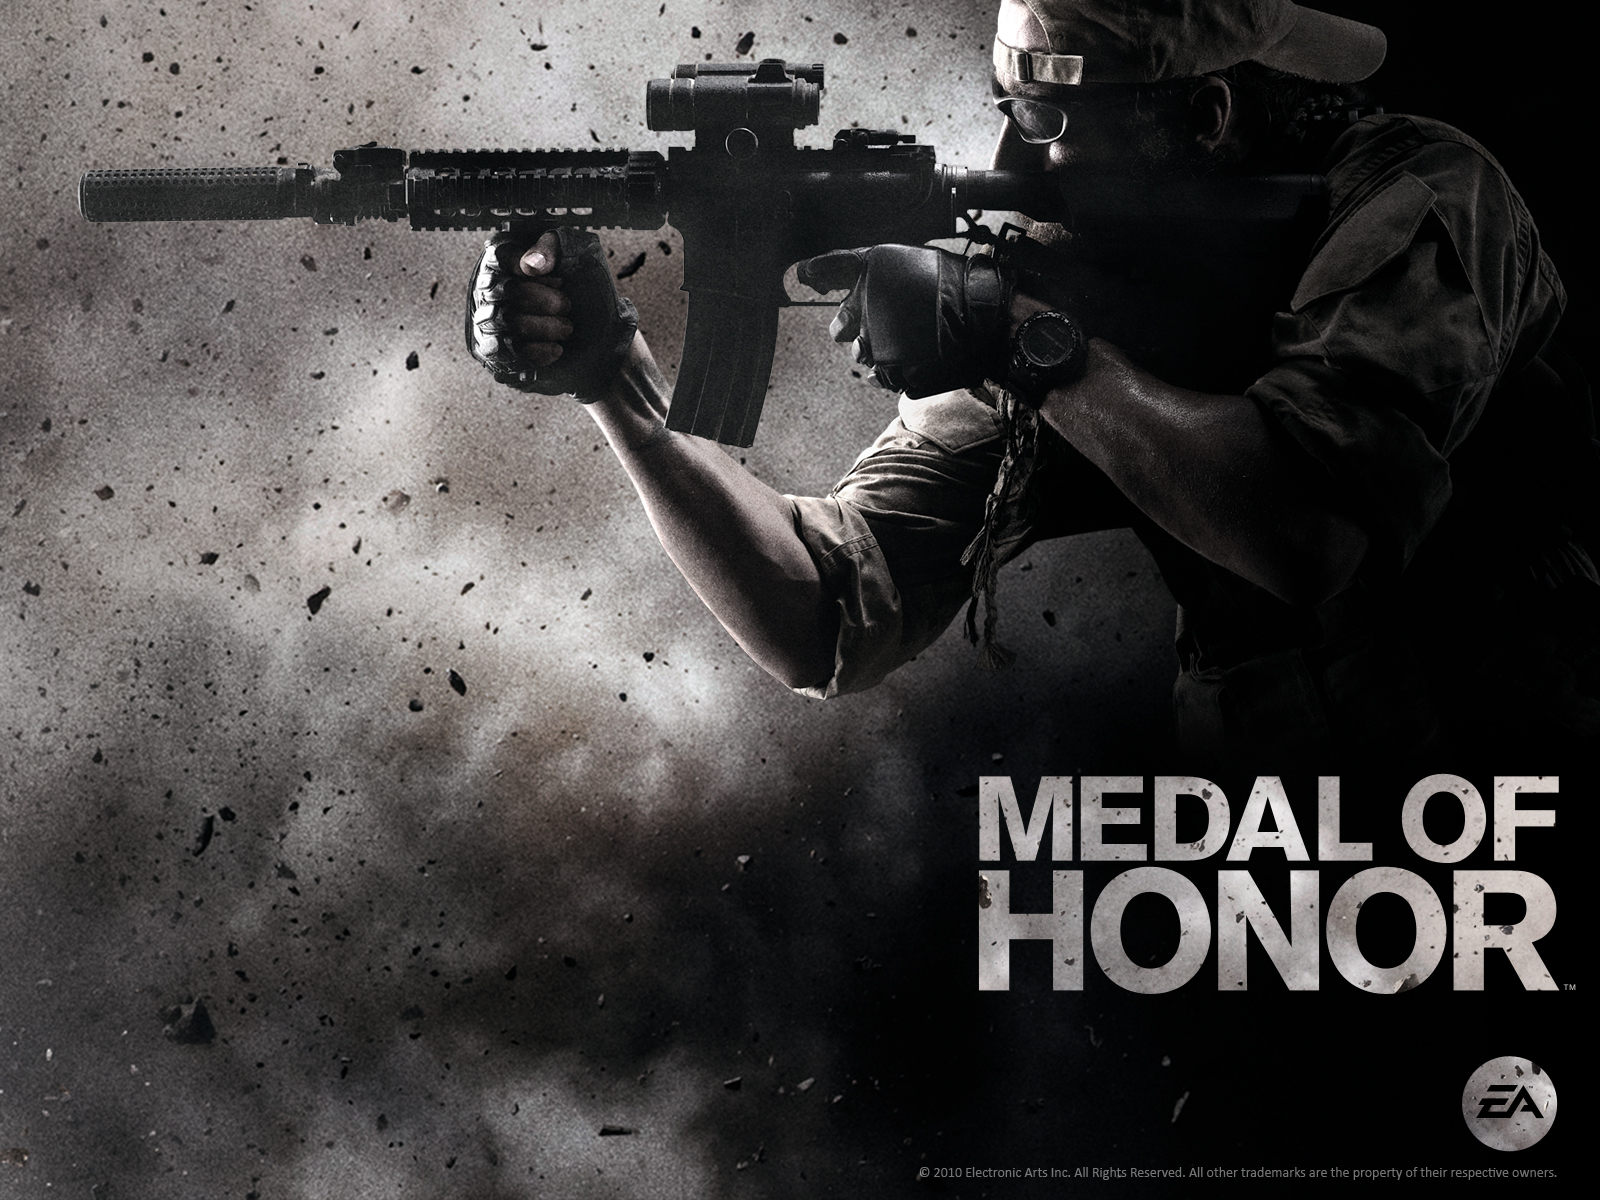 http://4.bp.blogspot.com/-ANzAZtiW9W8/TqVqCuQoWVI/AAAAAAAAAe8/3nYLTvhZsYM/s1600/medal-of-honor-wallpaper-01.jpg